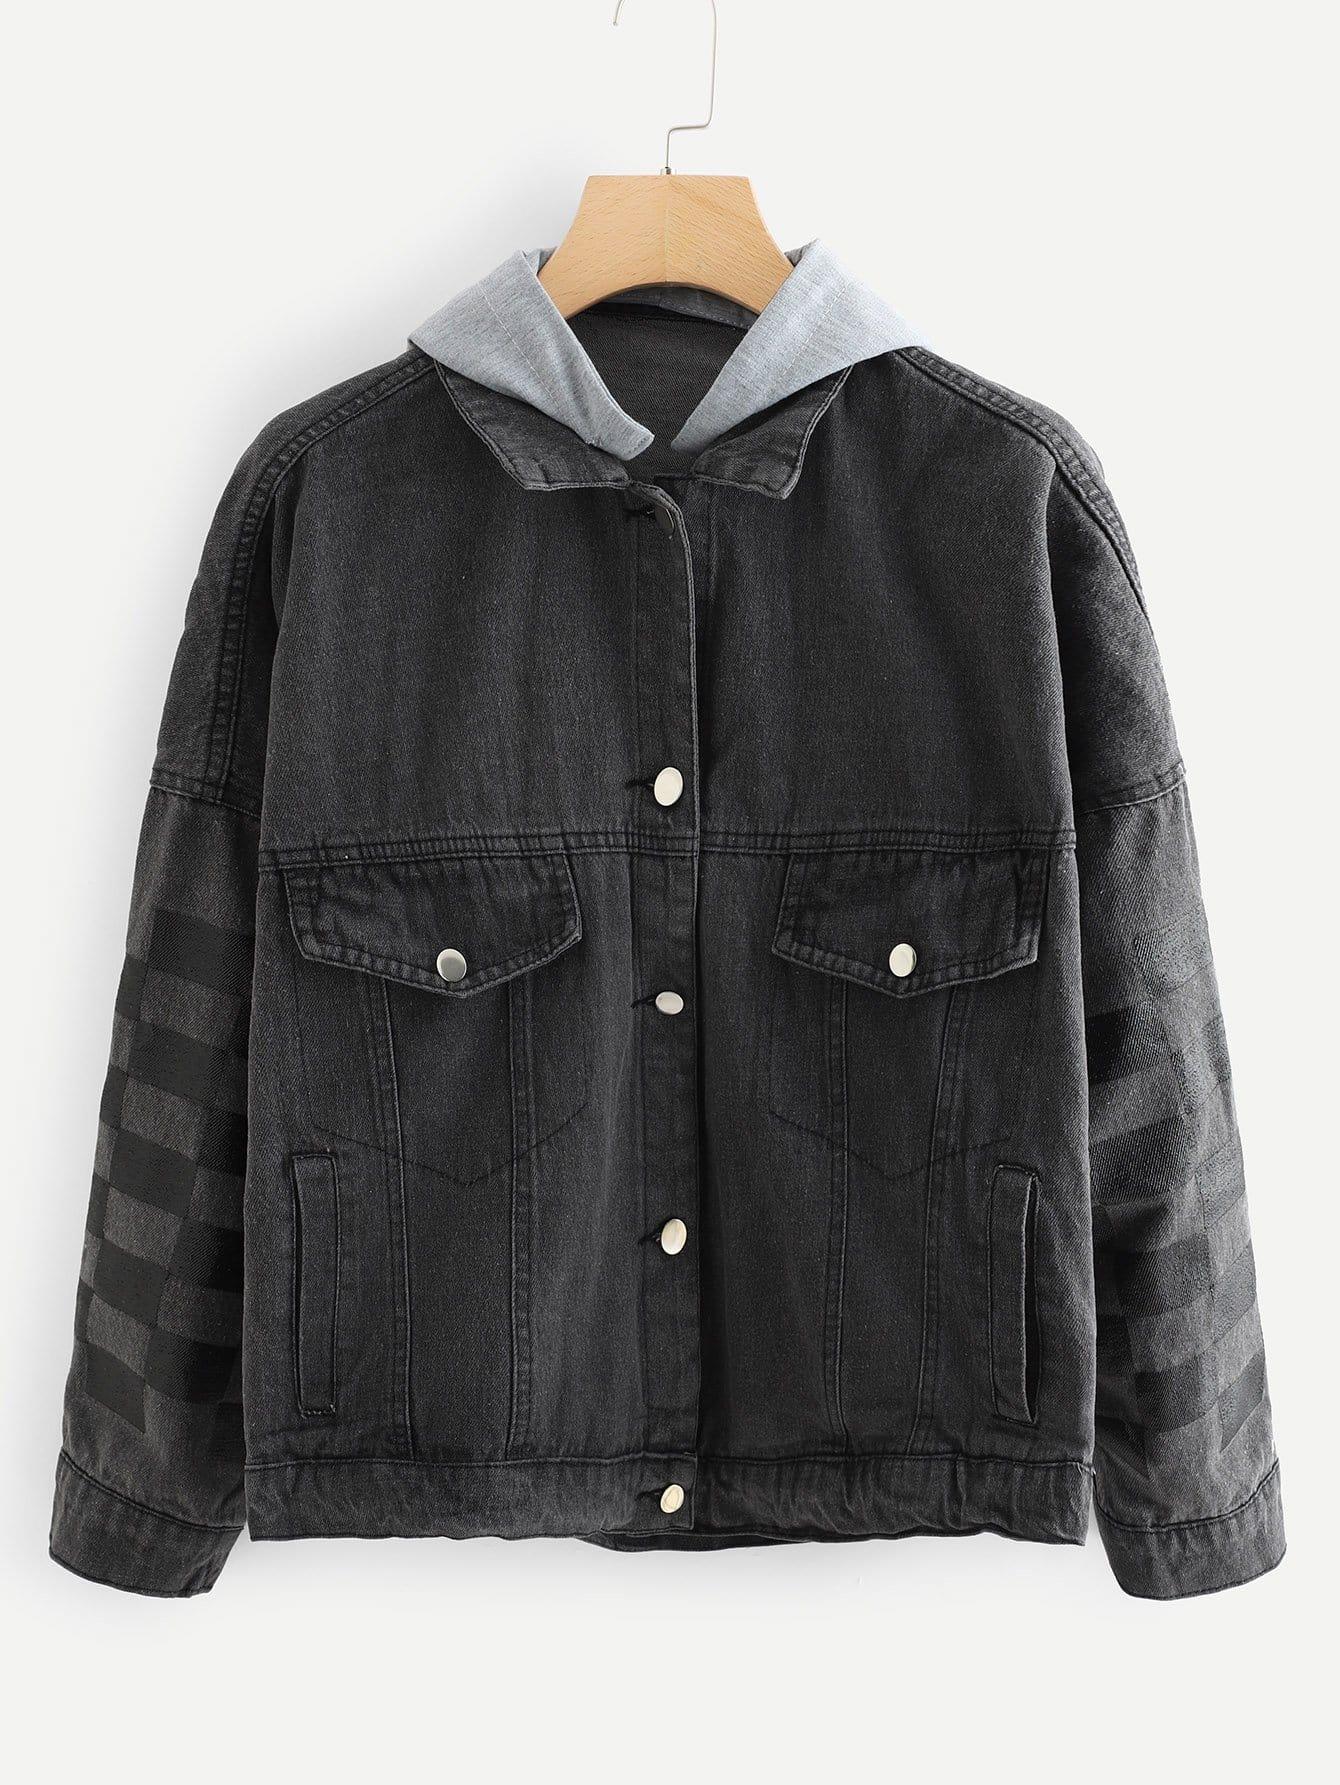 Jeans Jacke mit Kapuze